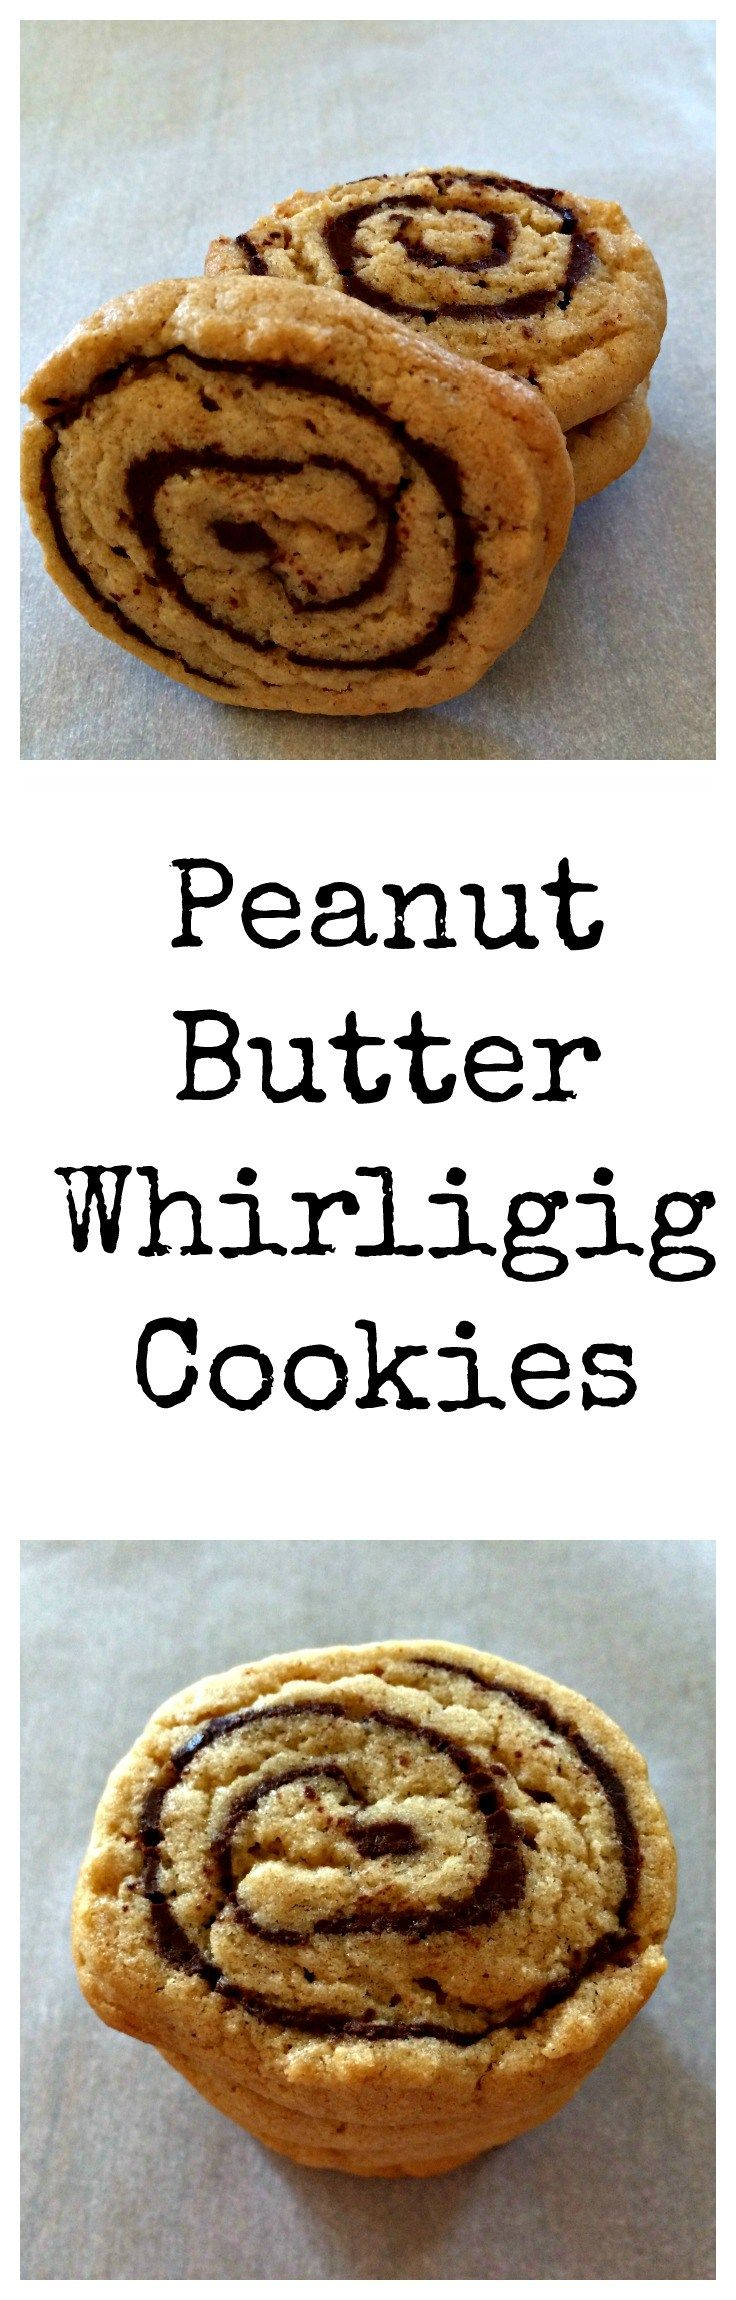 Peanut Butter Chocolate Pinwheel Cookies